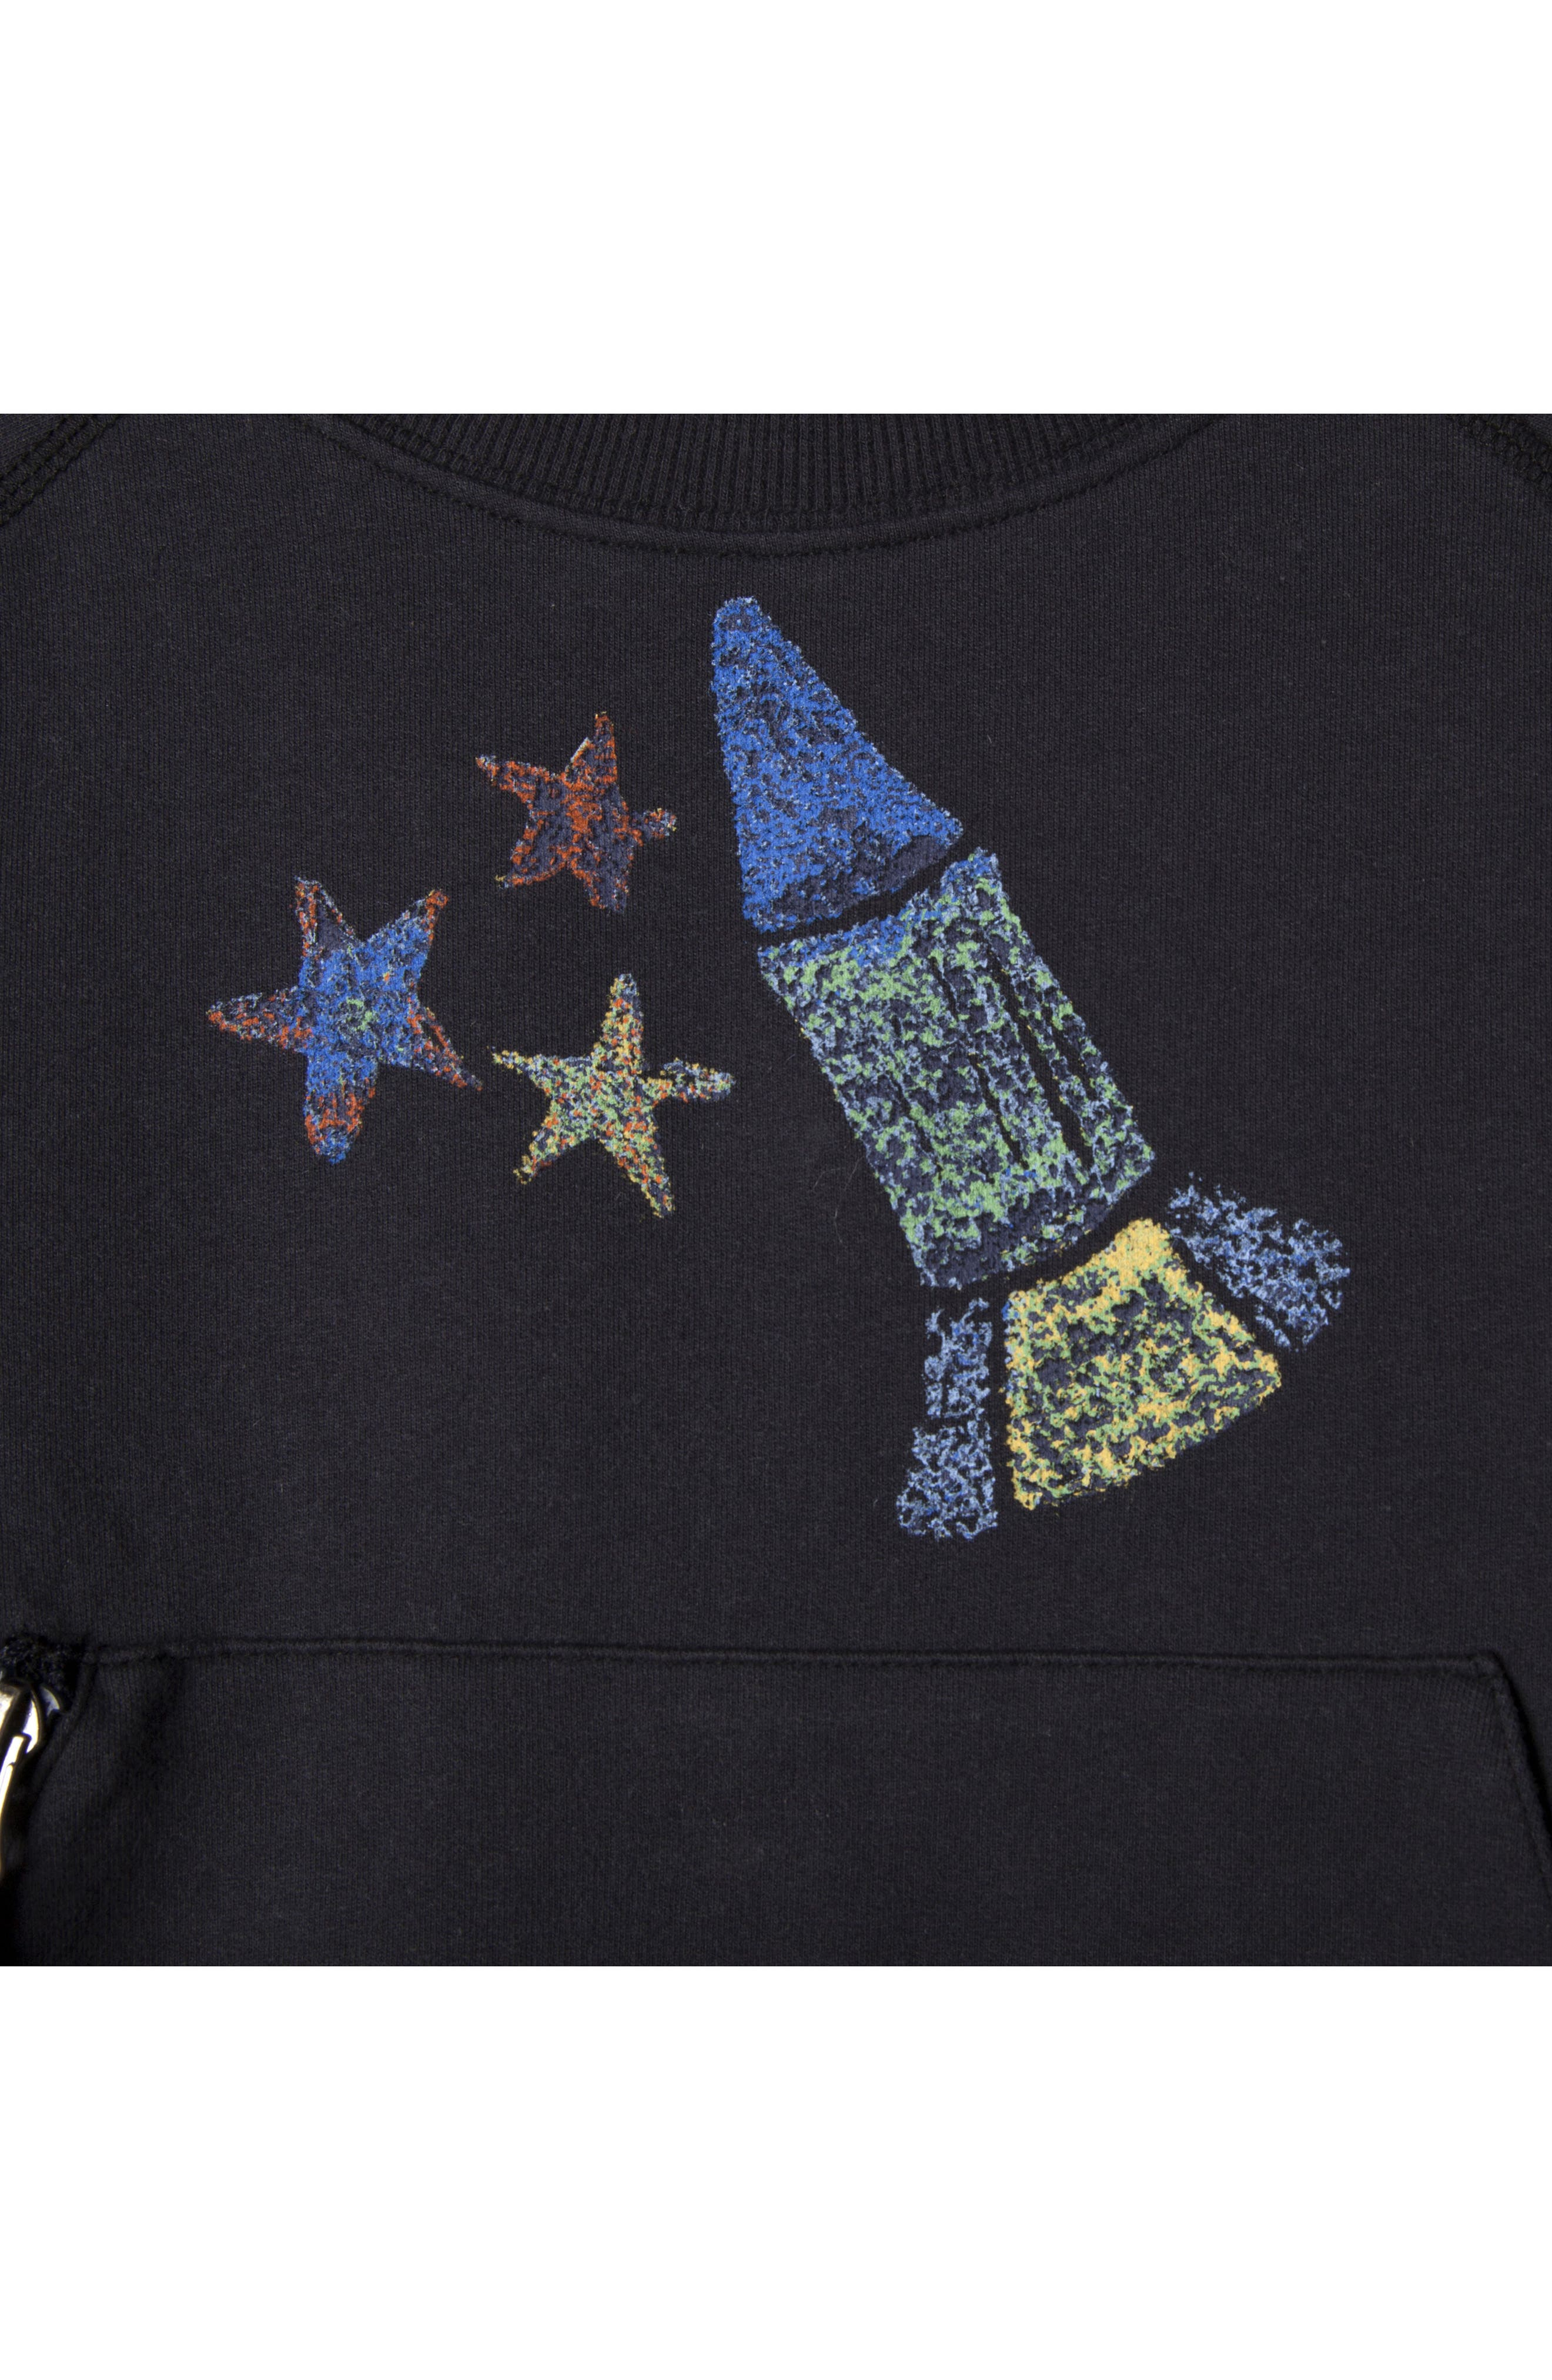 Jaxon Organic Cotton Sweatshirt,                             Alternate thumbnail 2, color,                             414